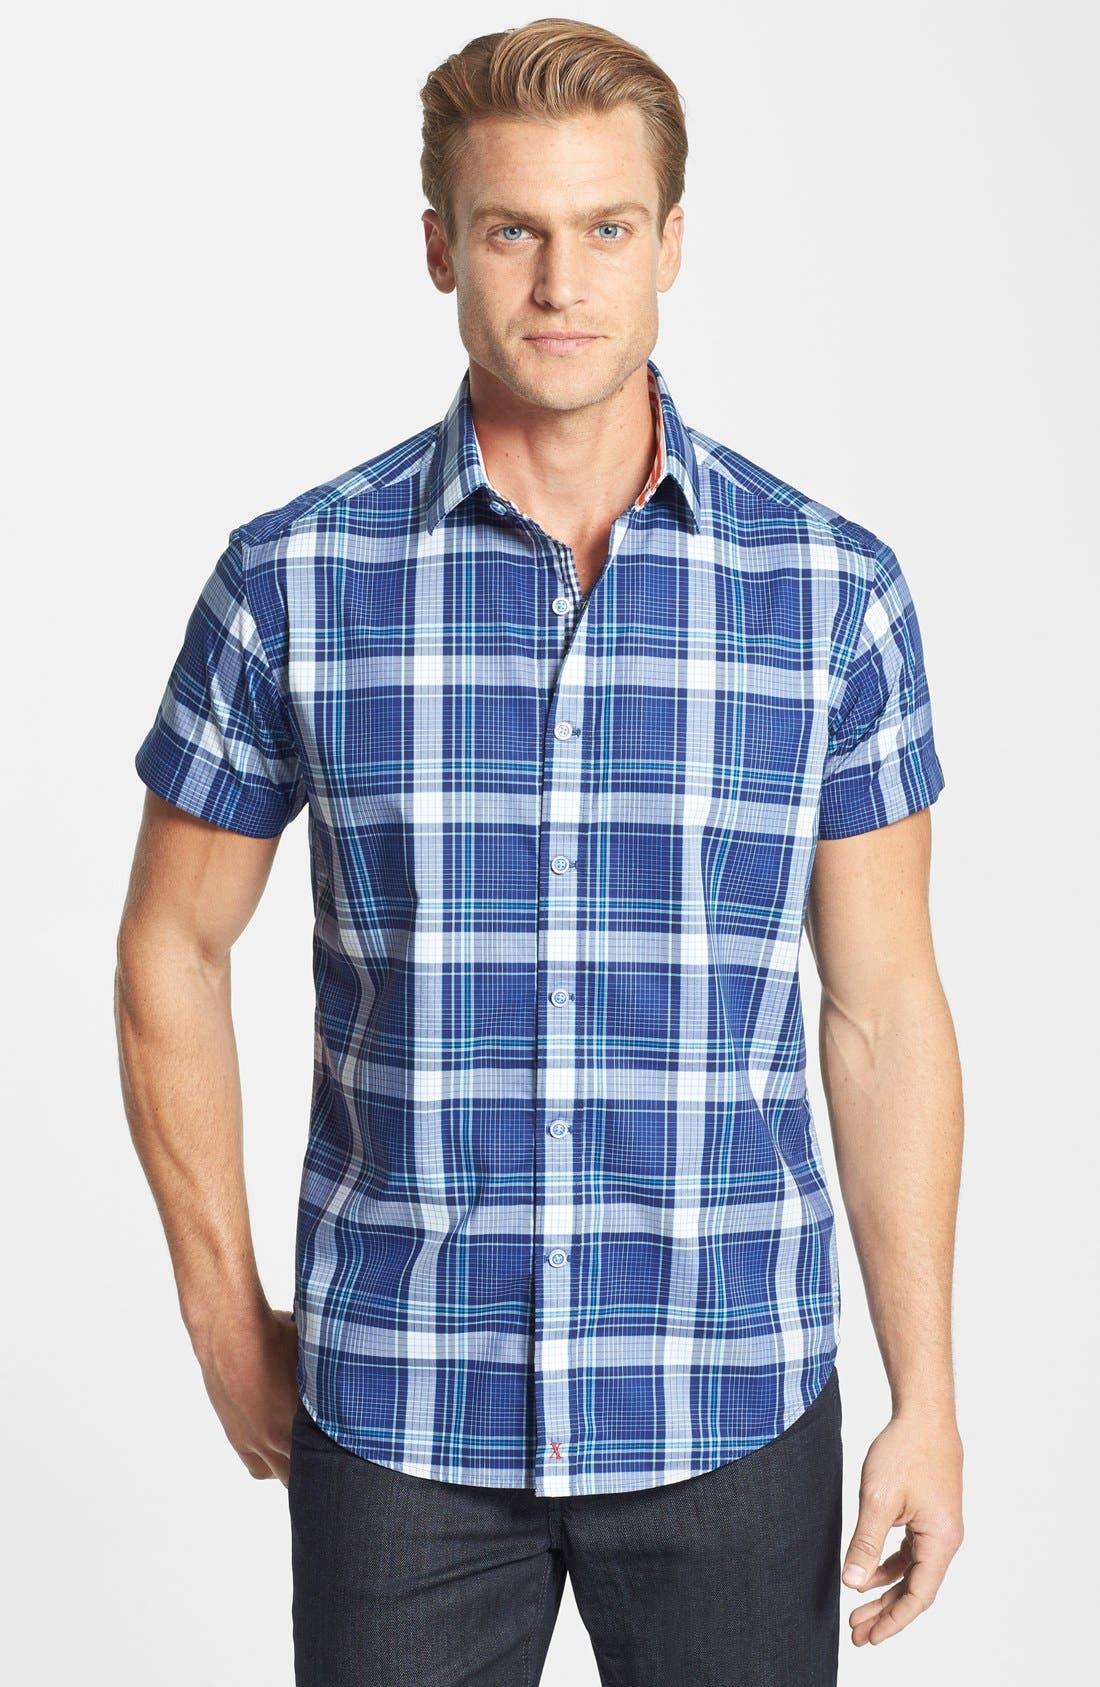 Main Image - Robert Graham 'Sandstone' Tailored Fit Cotton Short Sleeve Sport Shirt